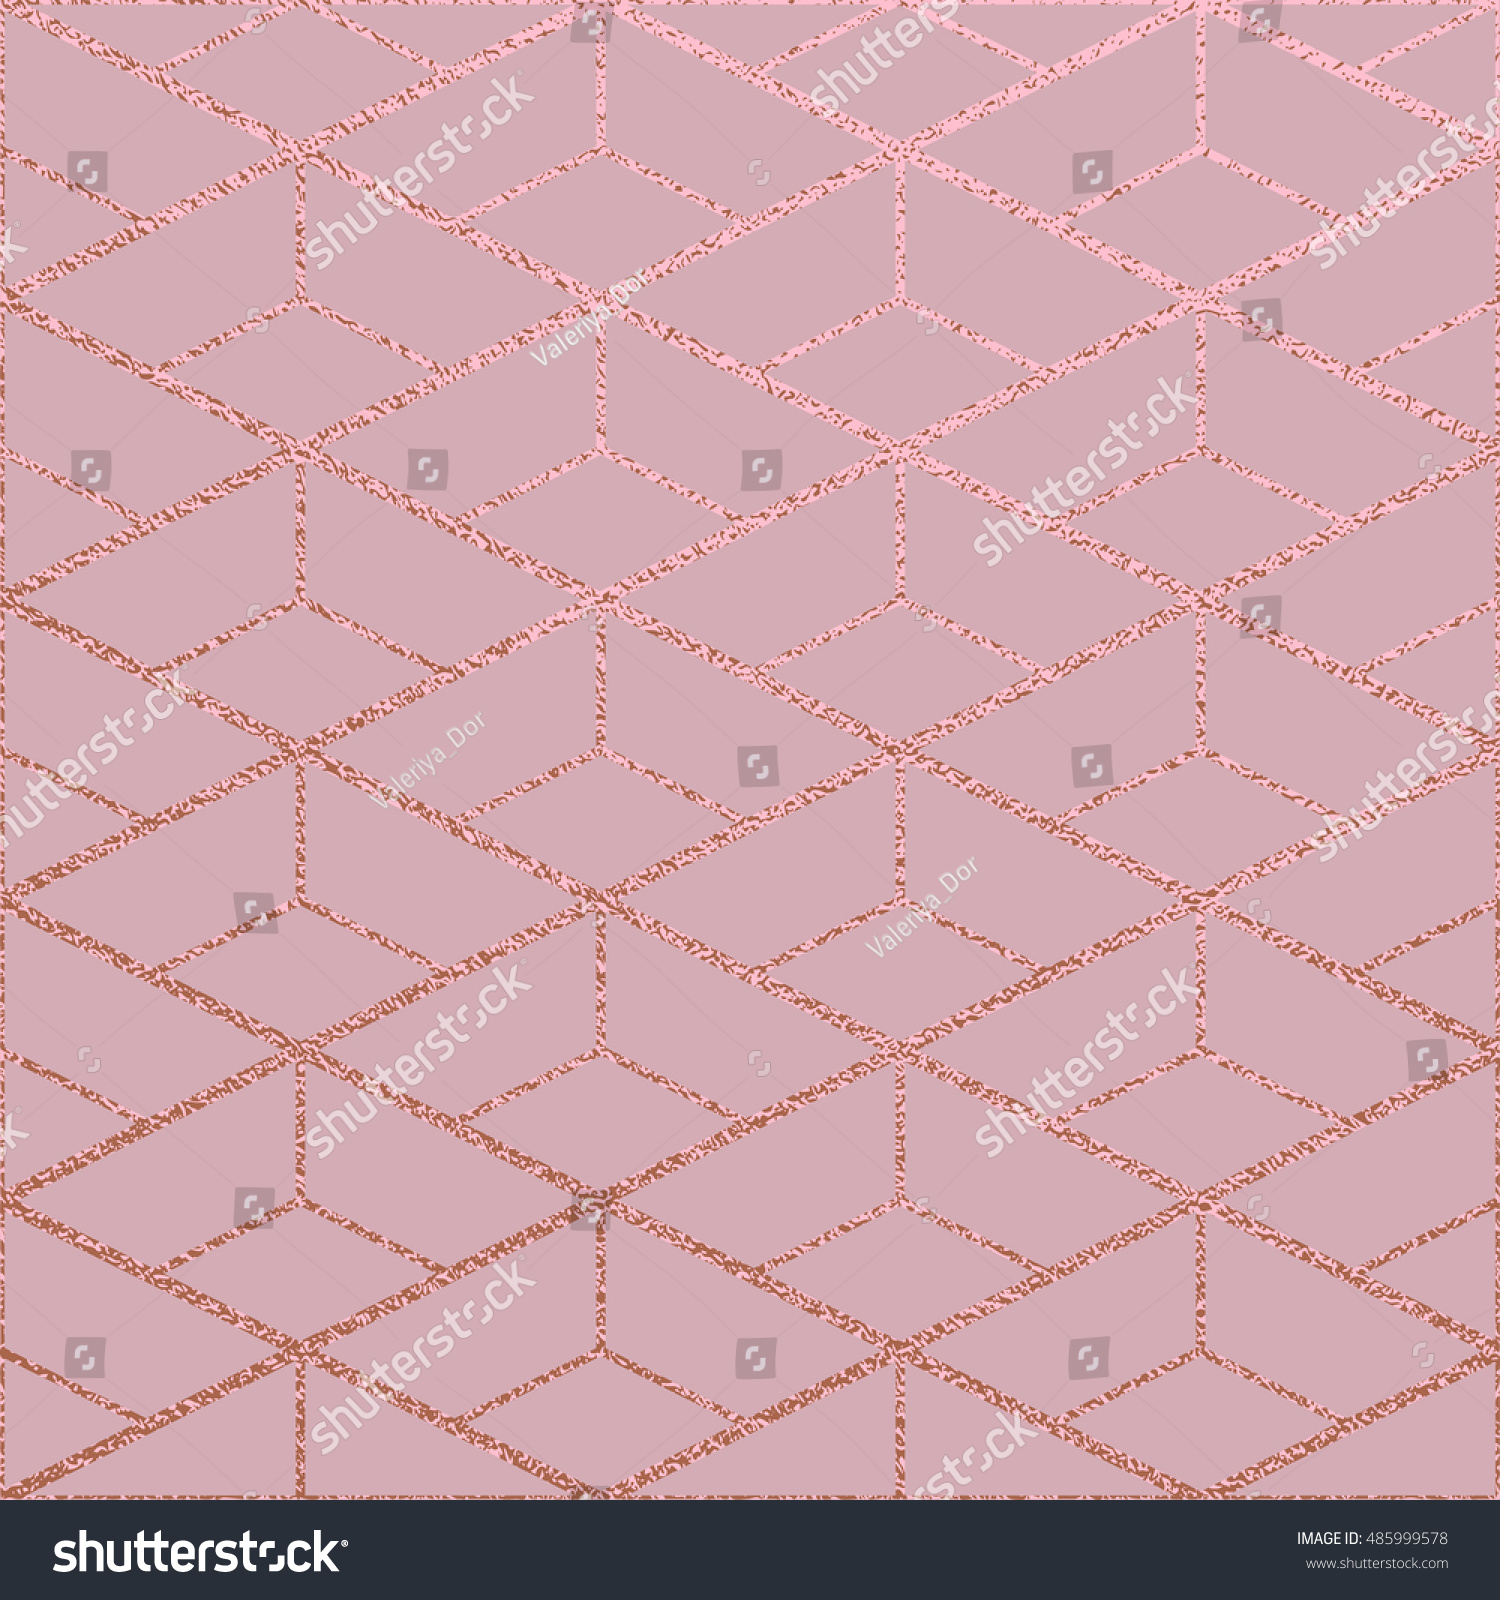 Ice Cream Background Sparking Shiny Decoration Free Vector: Metallic Glossy Texture Rose Quartz Pattern Stock Vector